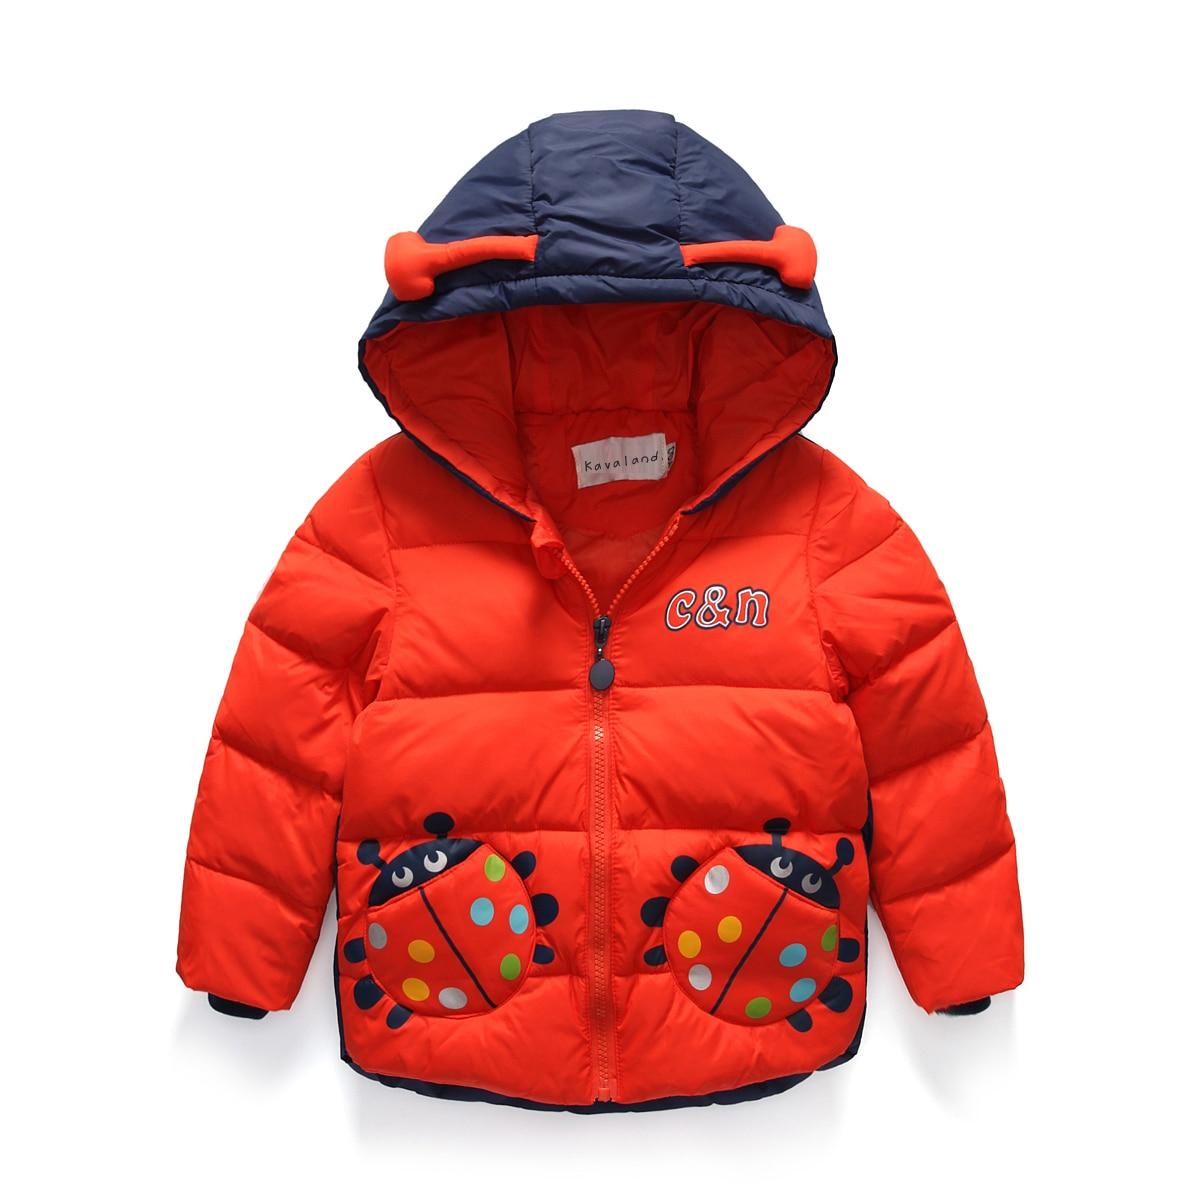 OLEKID 2017 Children Boys Winter Down Coat Cartoon Beatles Hooded Jackets For Girls 3-9 Years Kids Boys Outerwear Coat beatles beatles anthology 3 3 lp